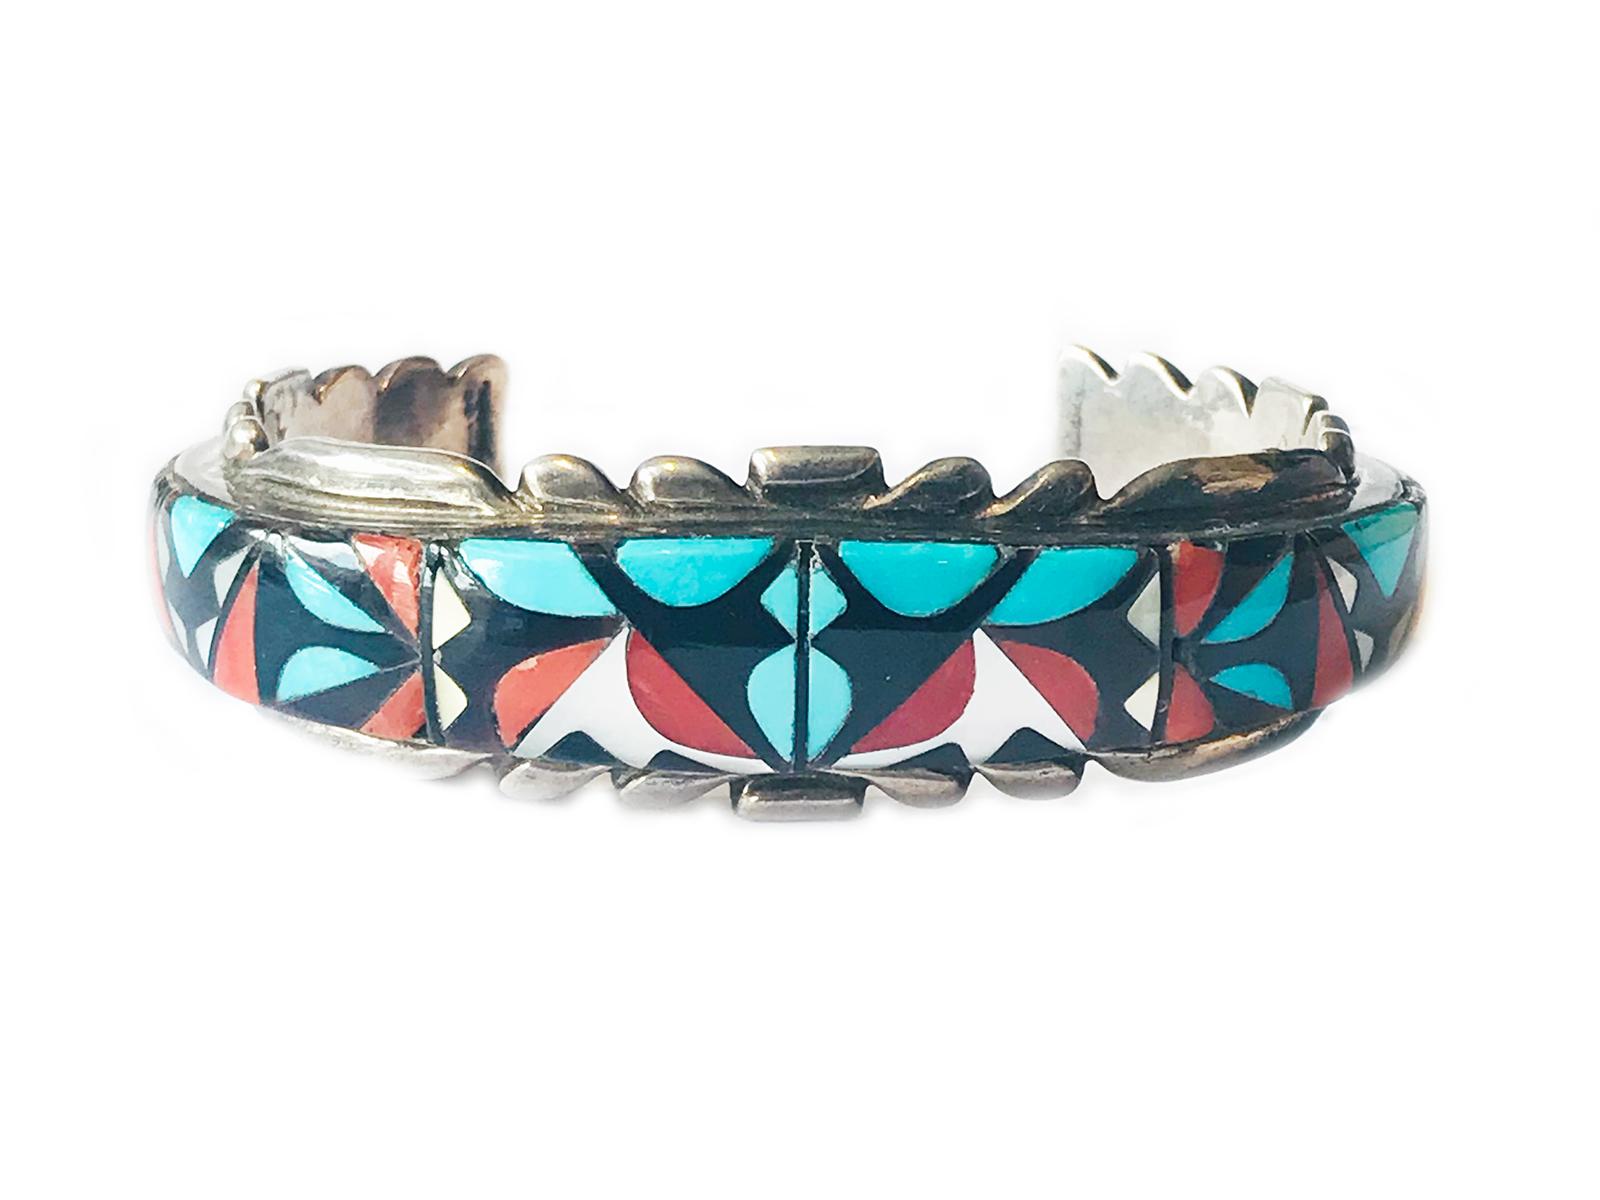 Mosaic Inlay Cuff